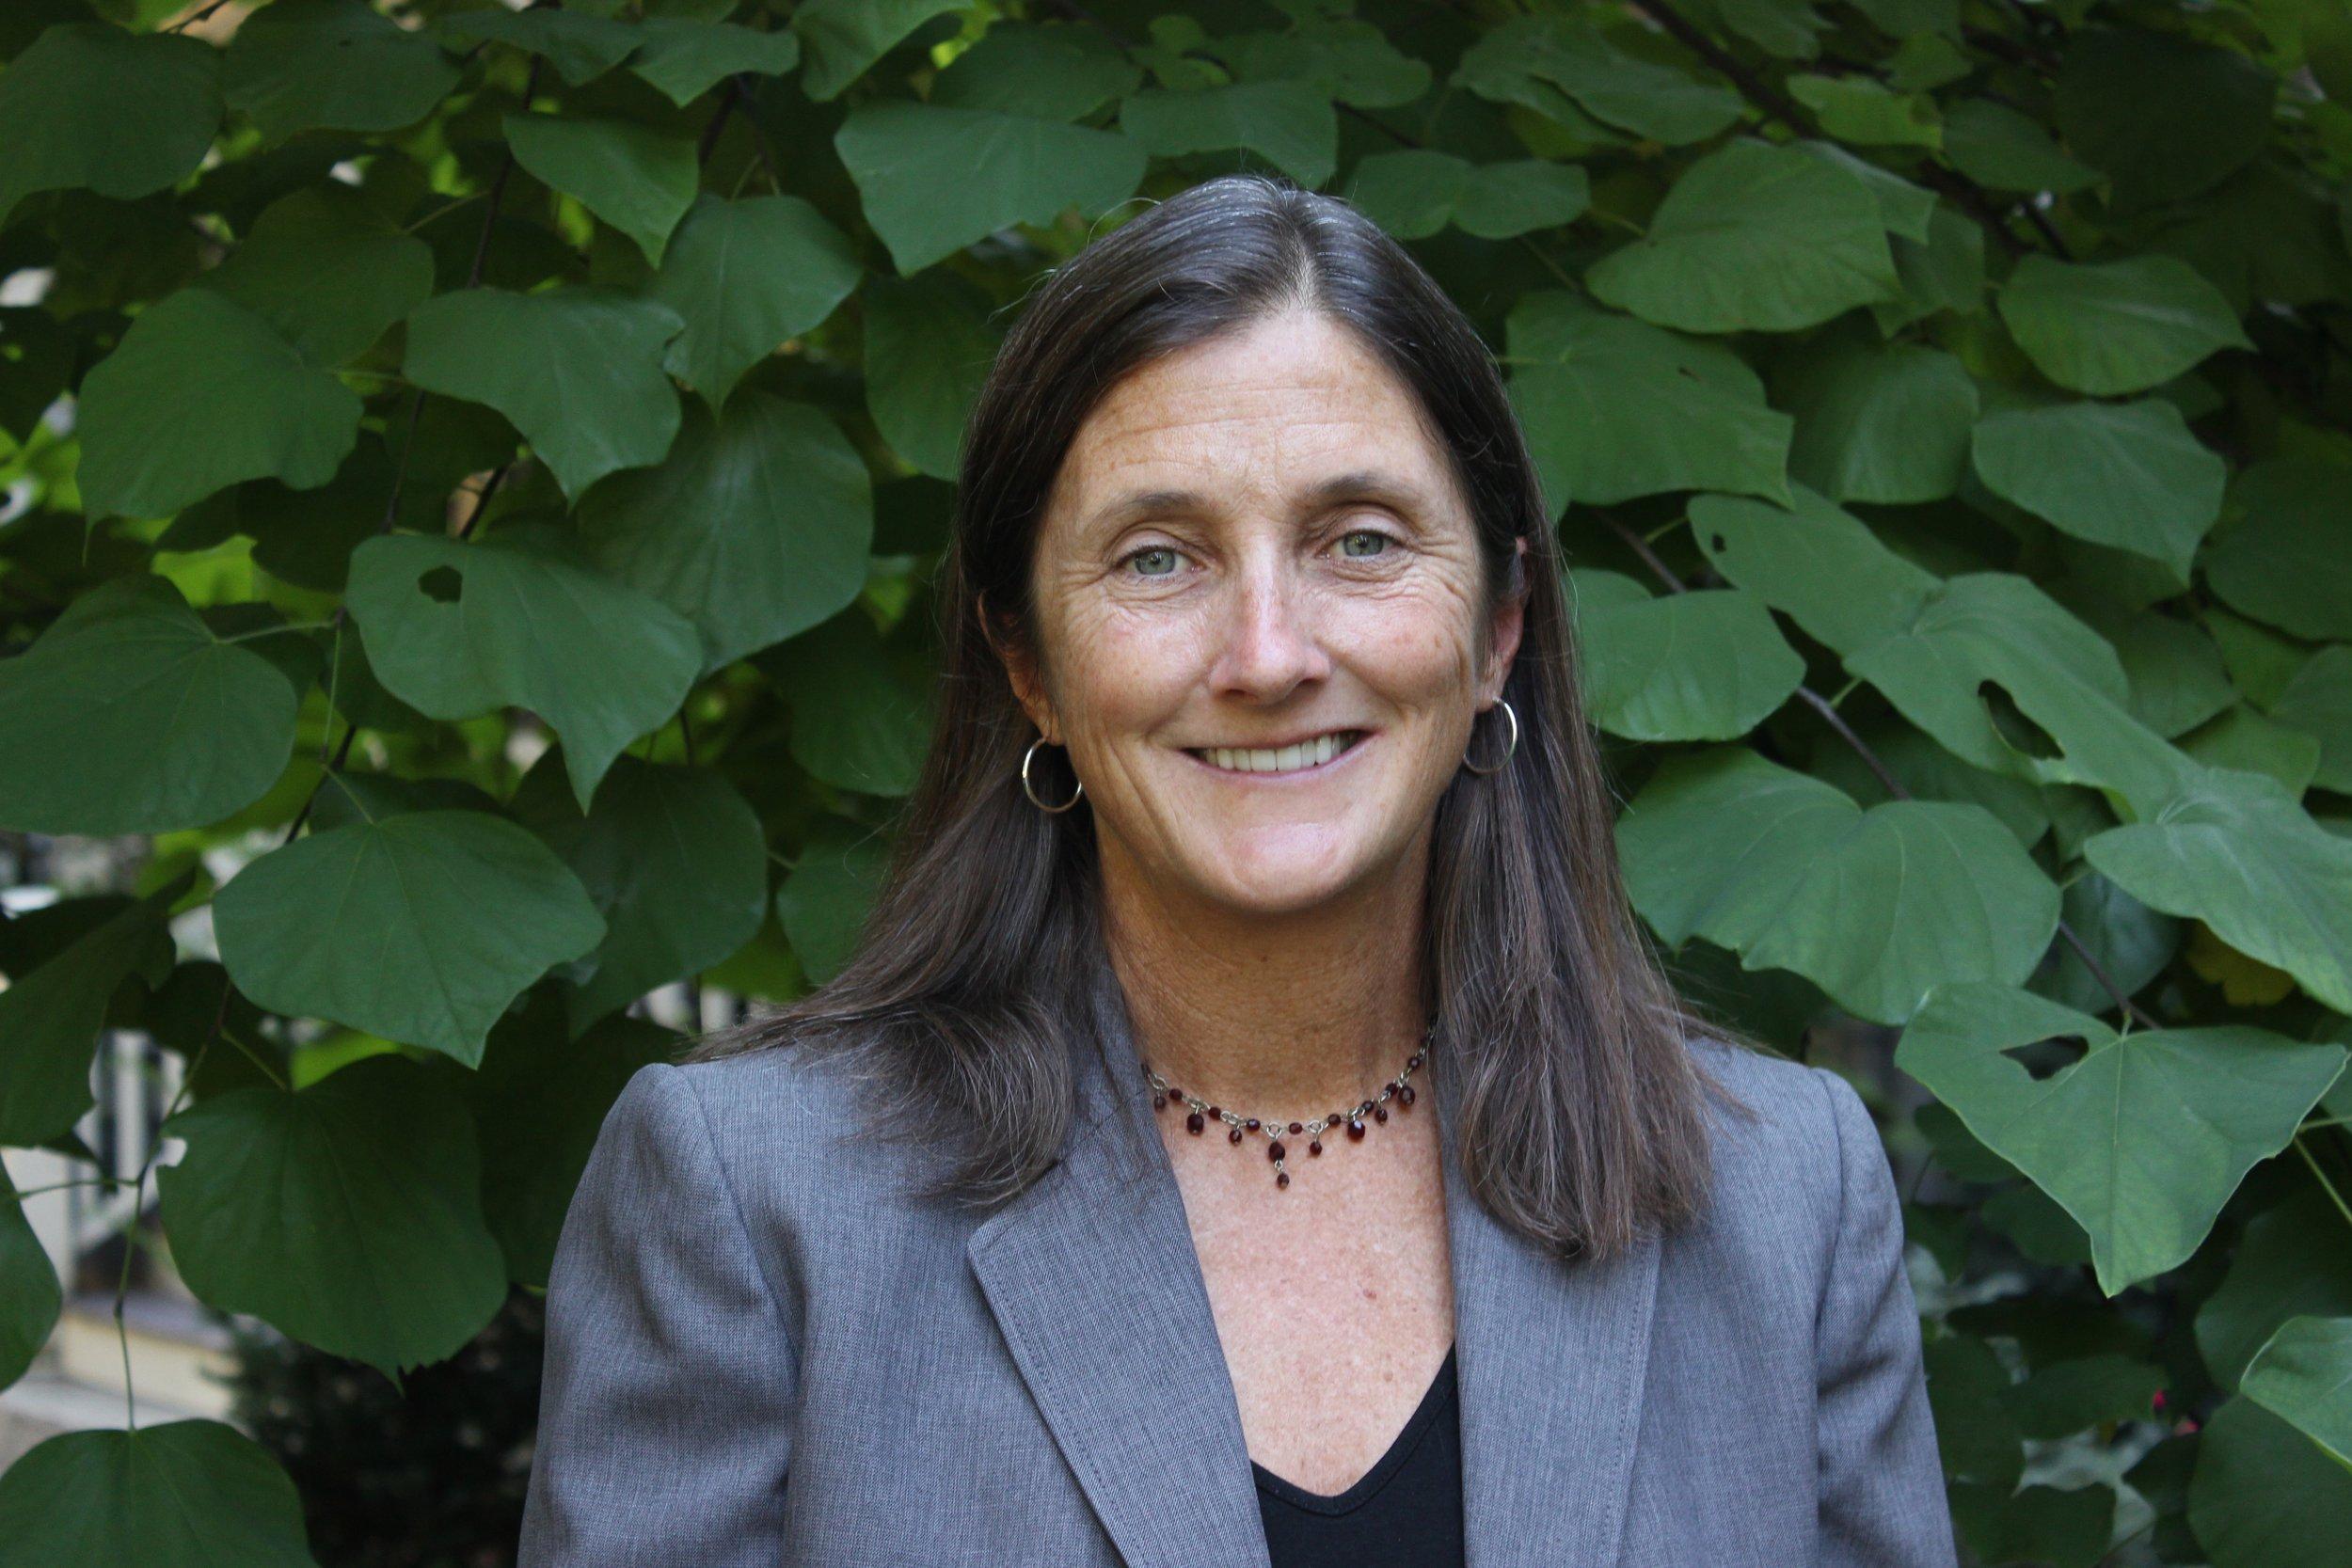 Paula Fazli, Founding Partner